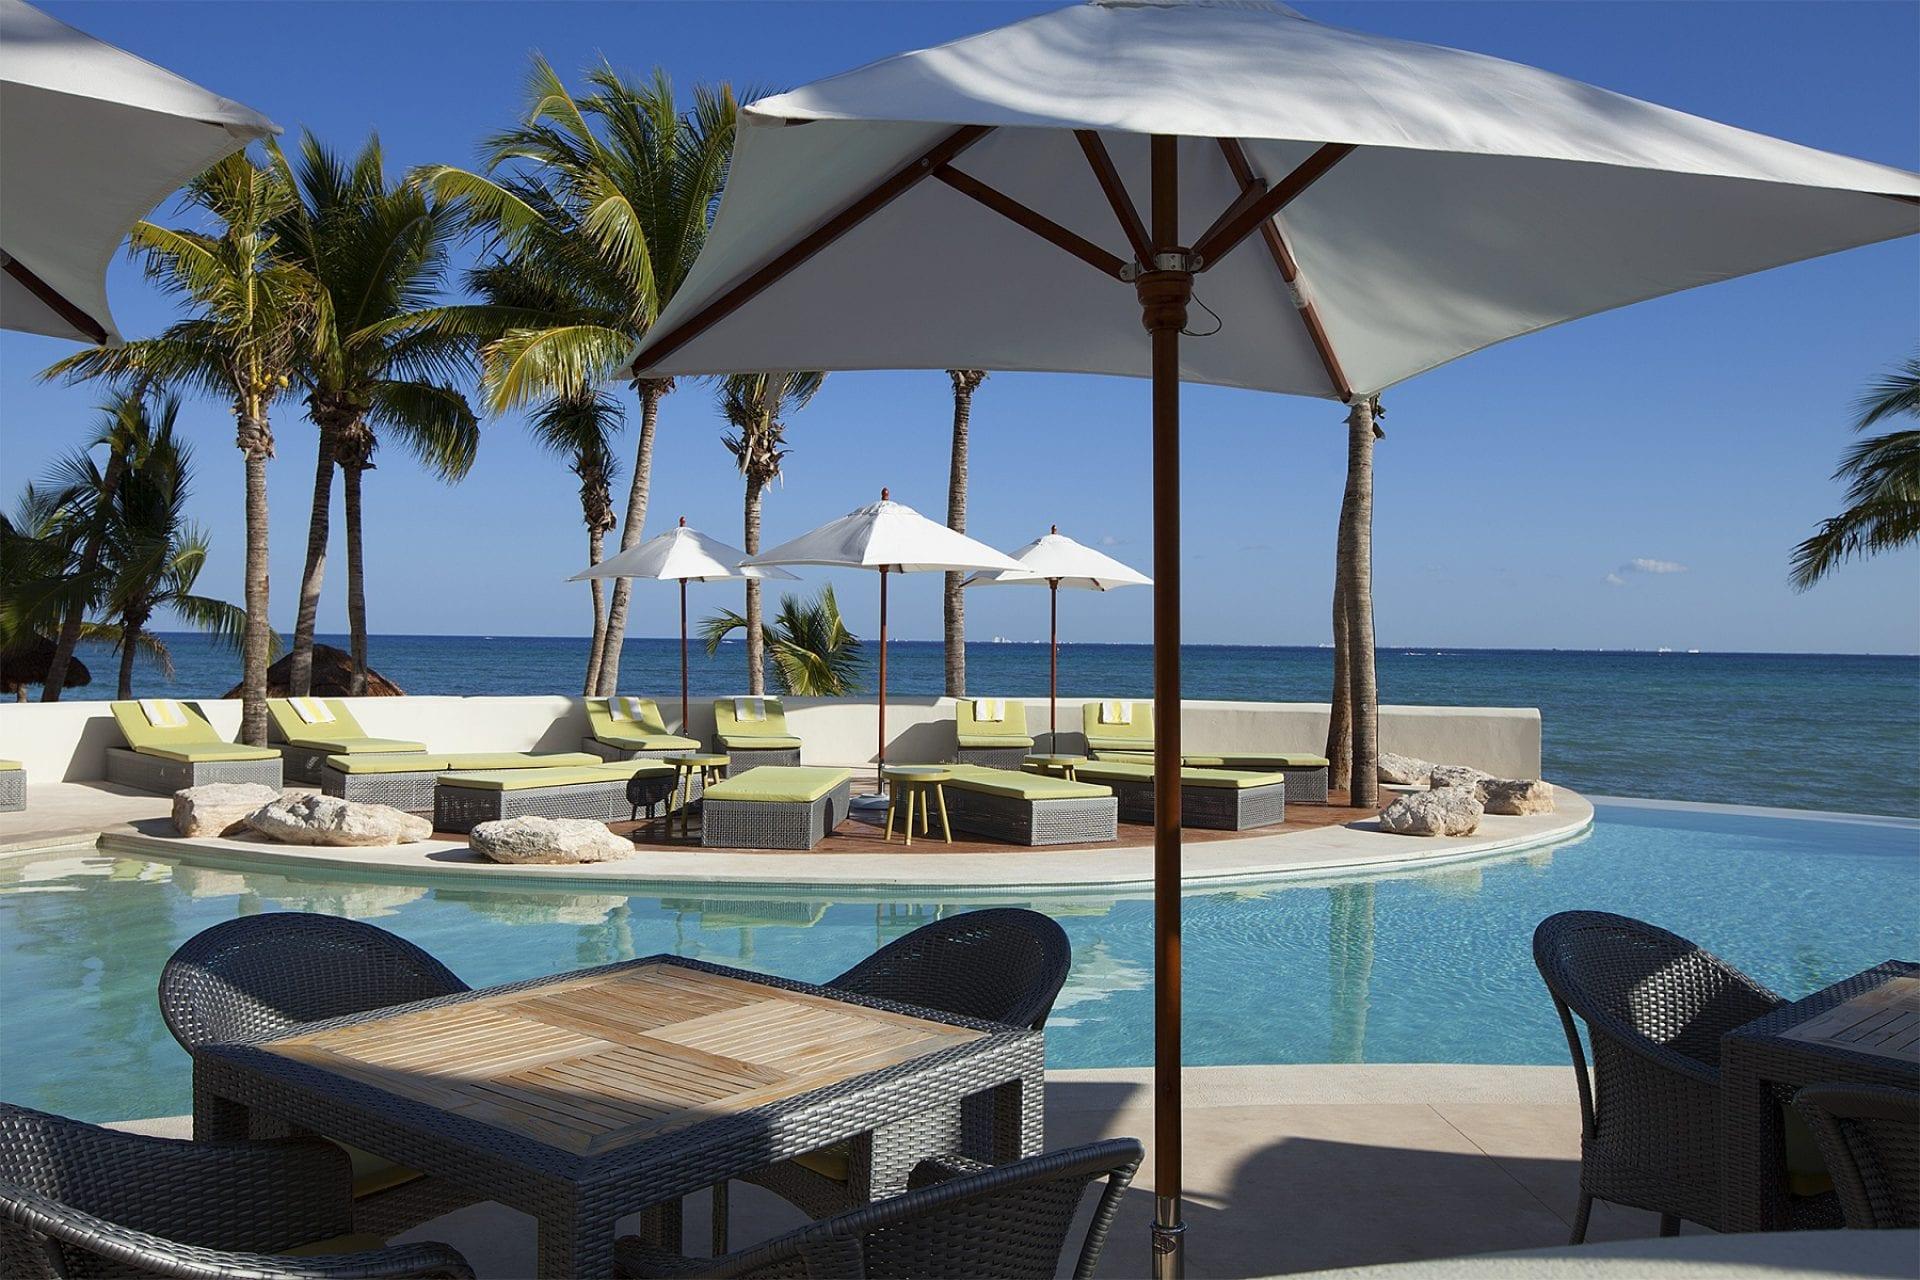 Poolside Lounge